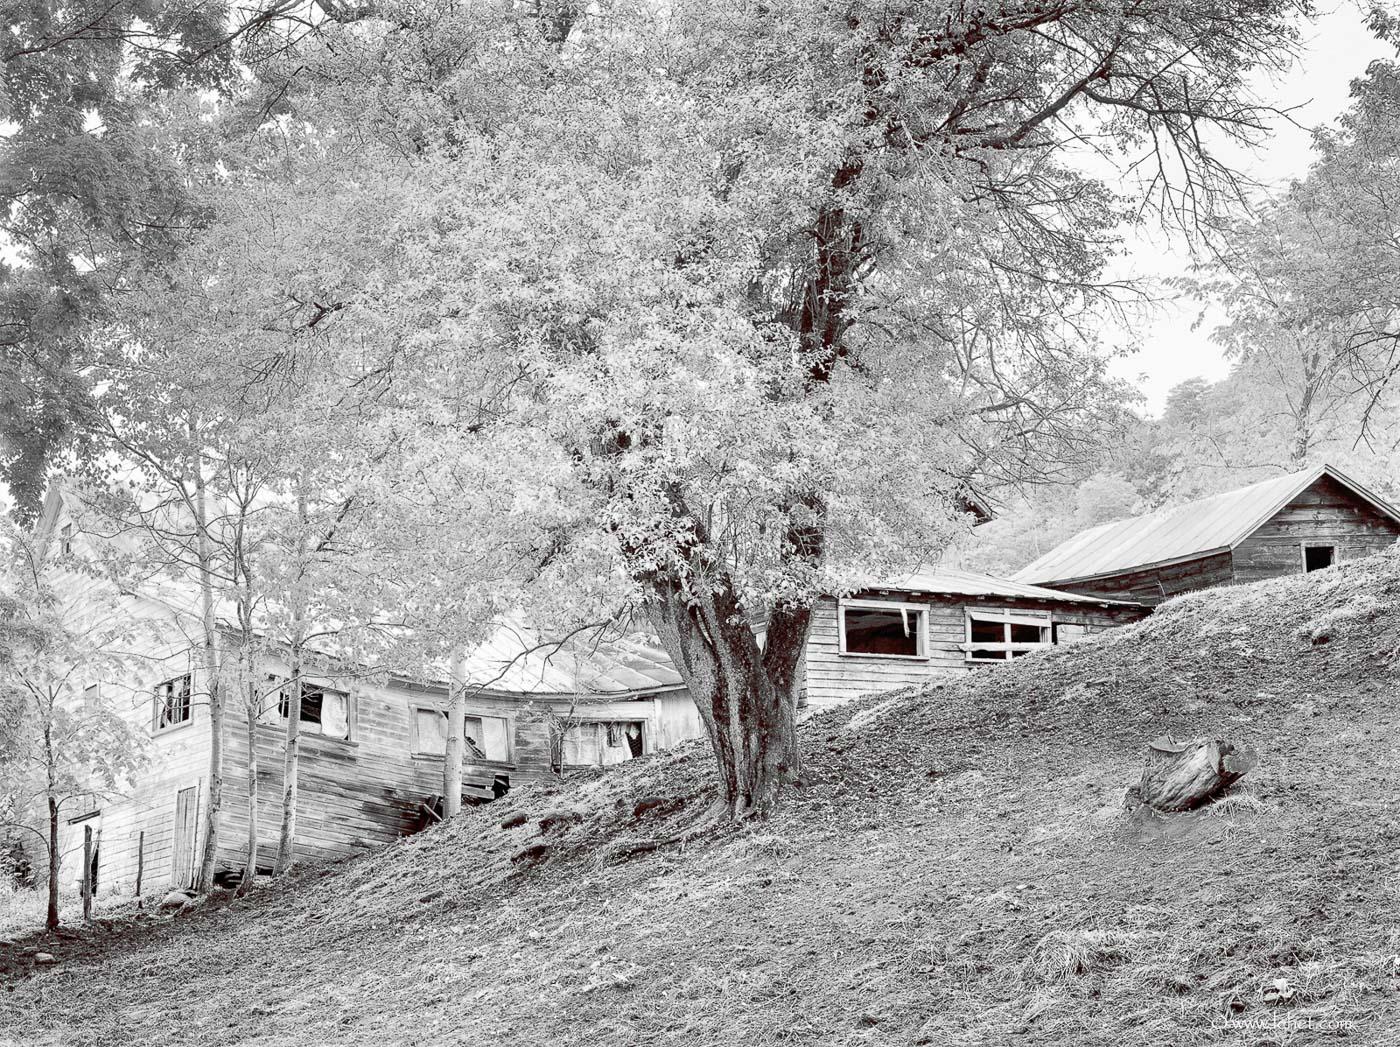 Tunbridge Vermont Barn Black and White Film Photo